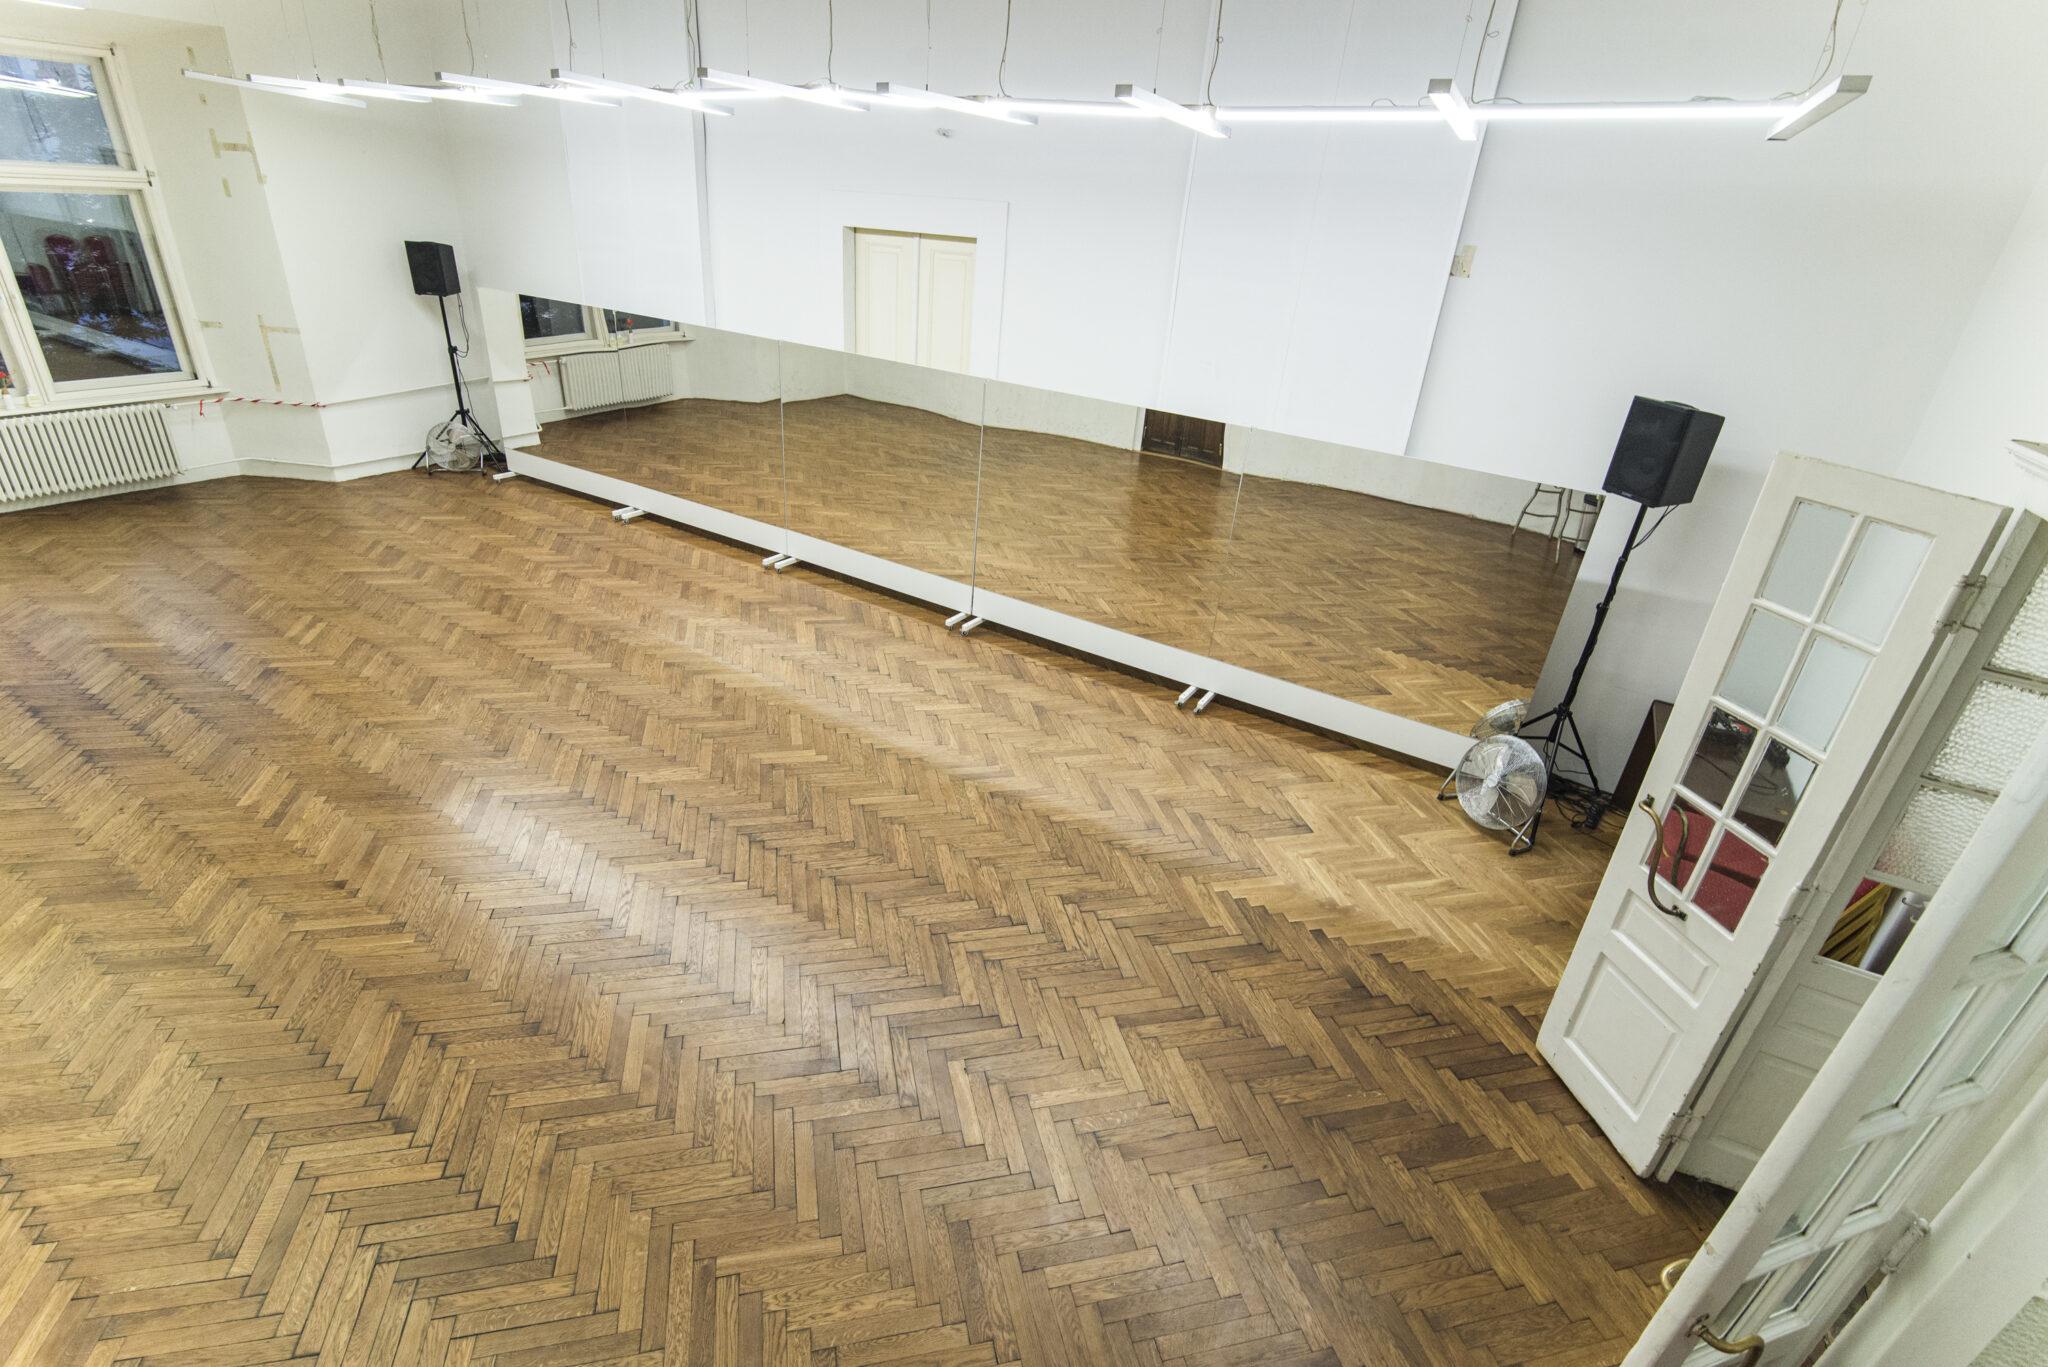 Sala Taneczna zlustrami nakółkach - 100m2